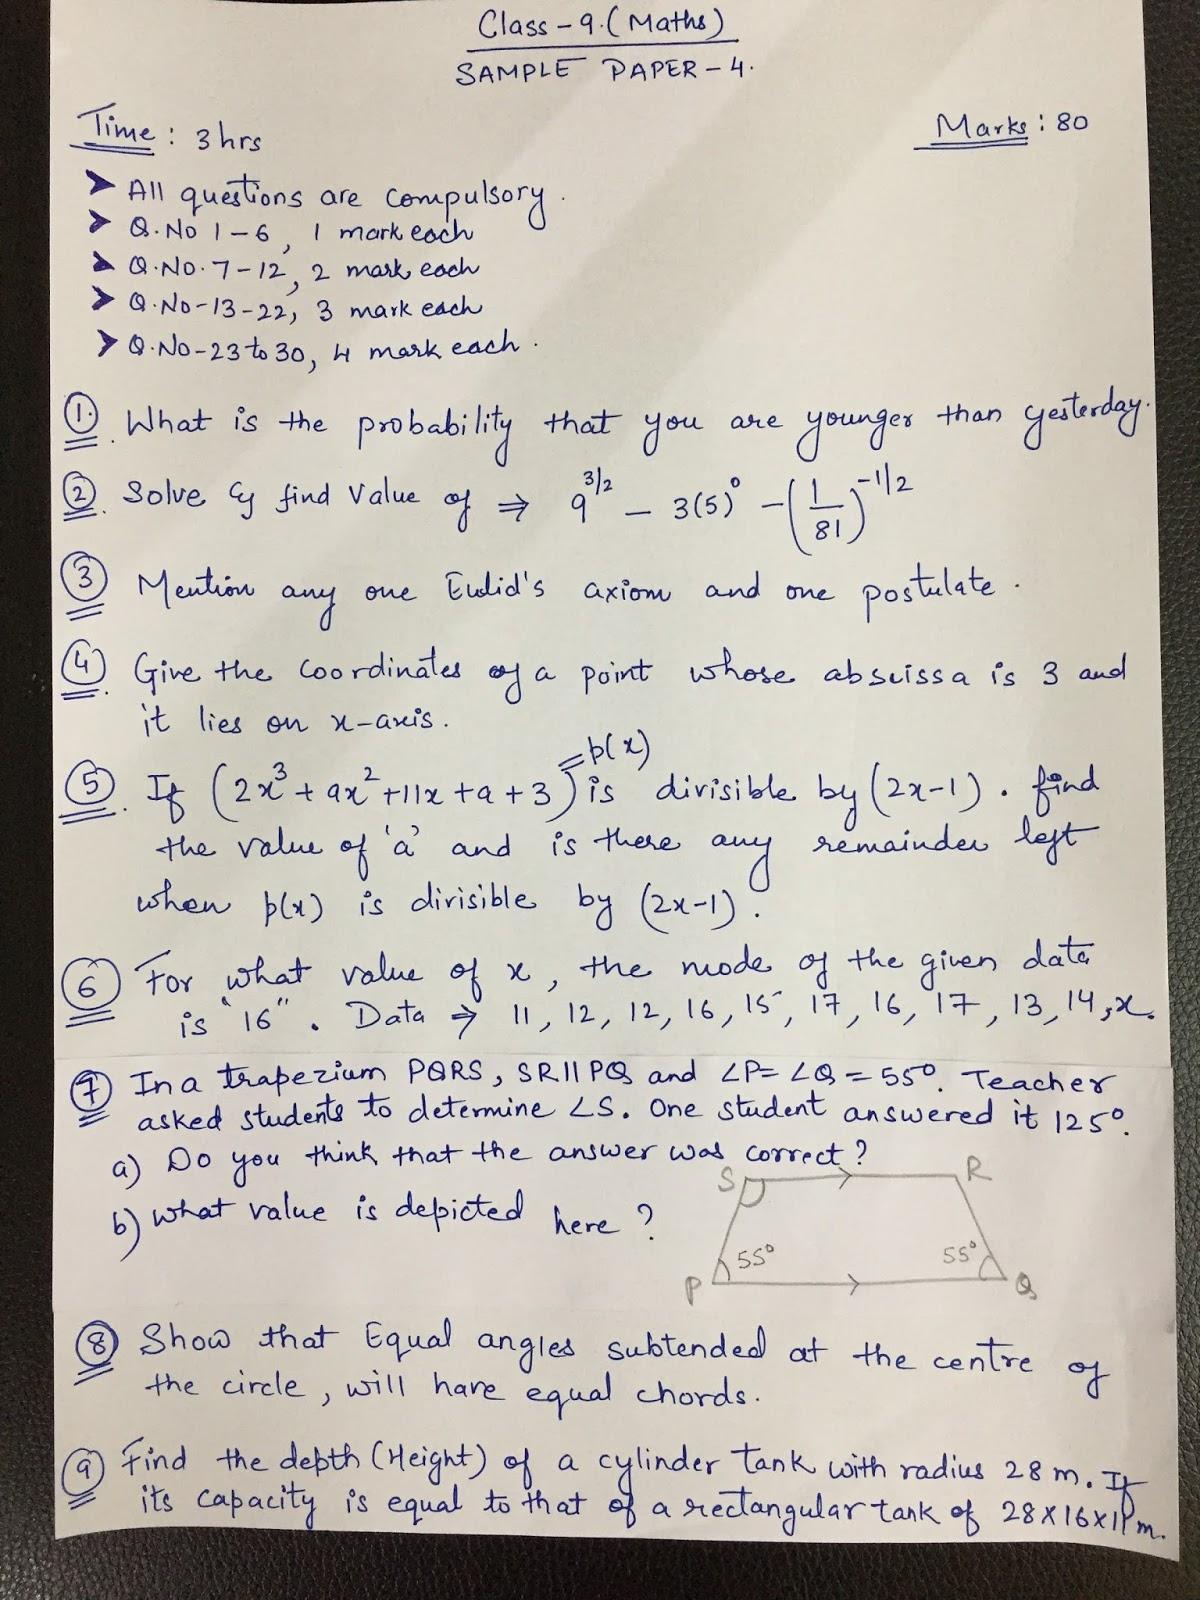 APS, Golconda | Priyanka Gupta: class 9/ MATHS/ sample paper 4